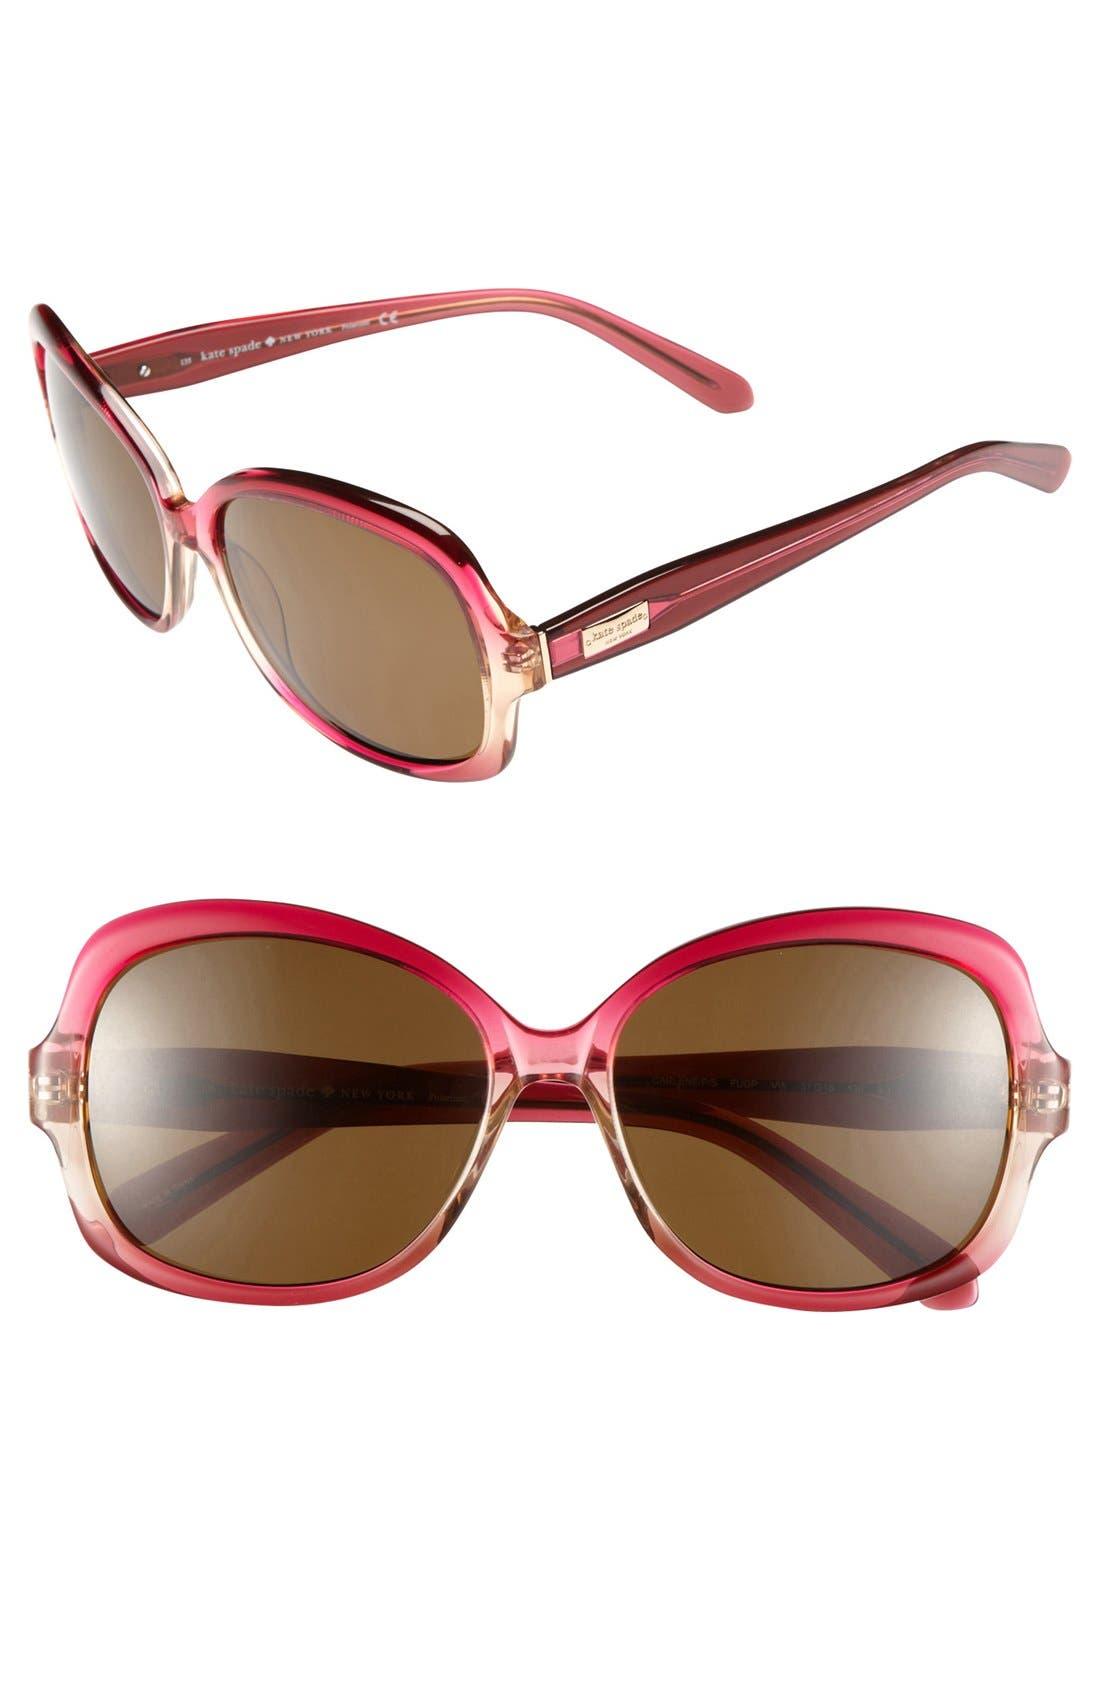 Main Image - kate spade new york 'carlene' 57mm polarized sunglasses